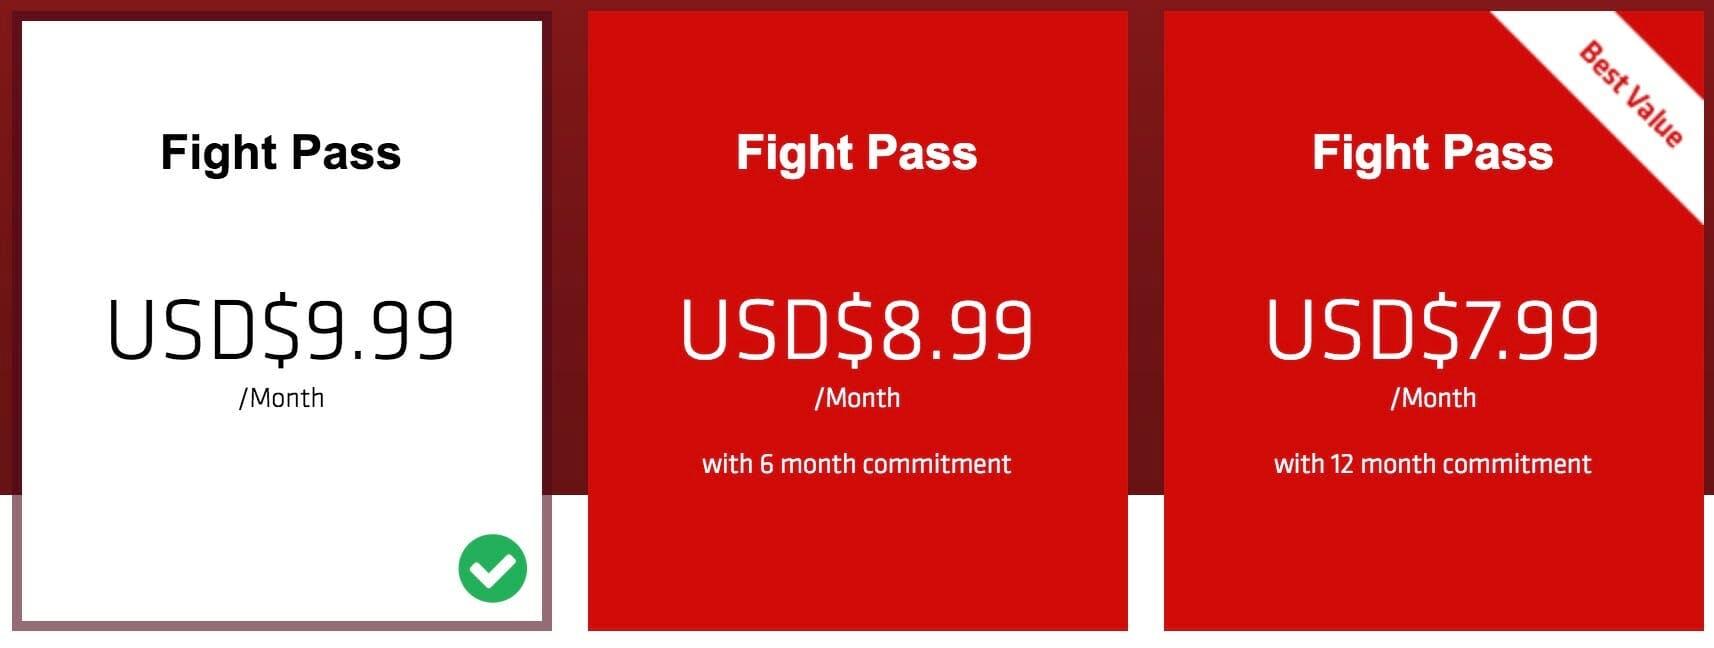 ufc 229 live stream fight pass